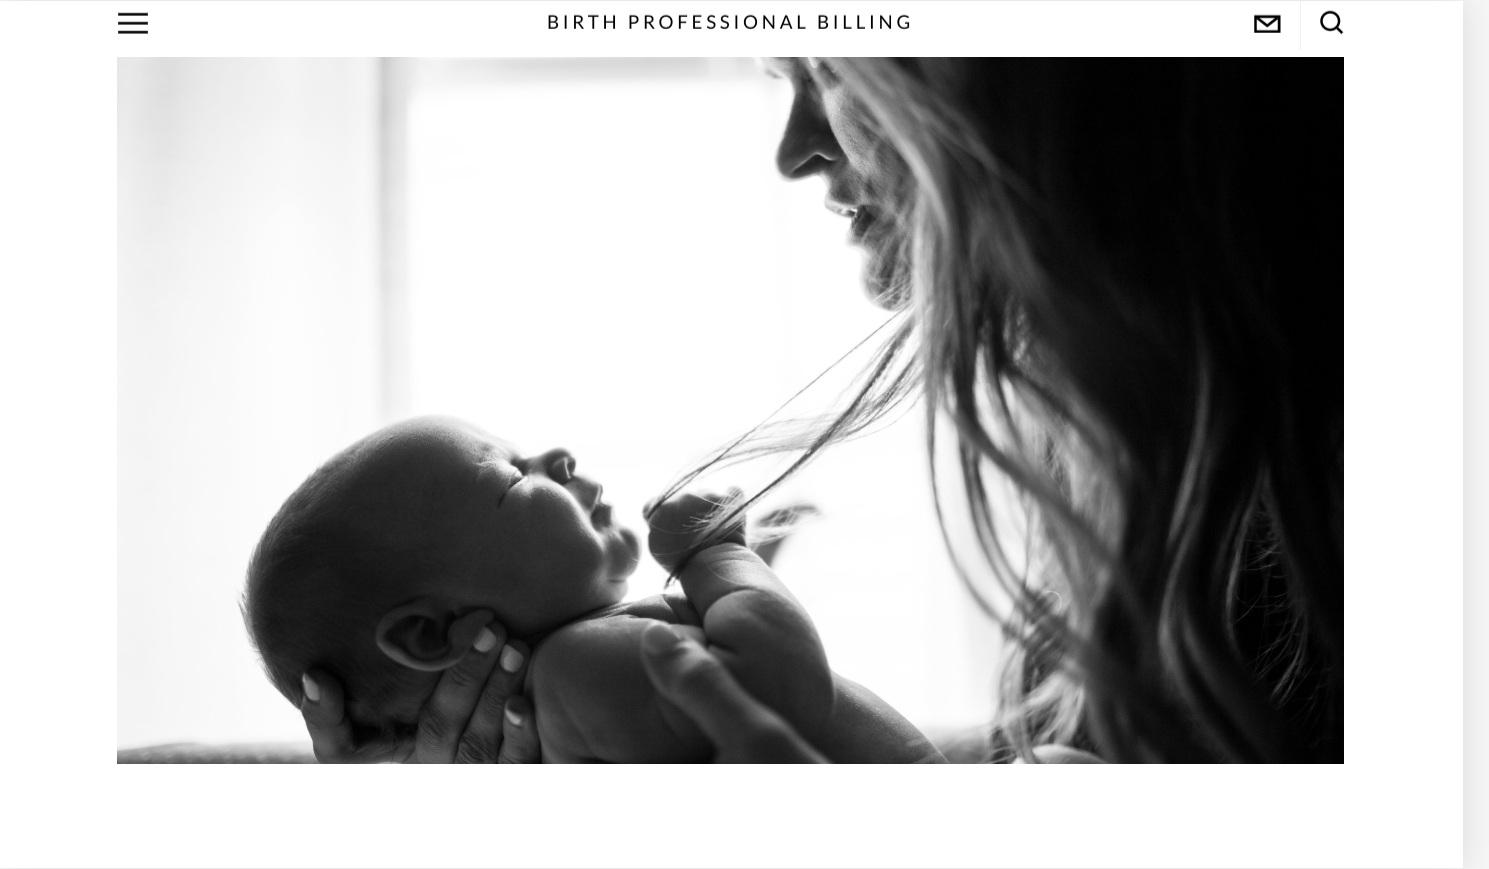 Birth Professional Billing